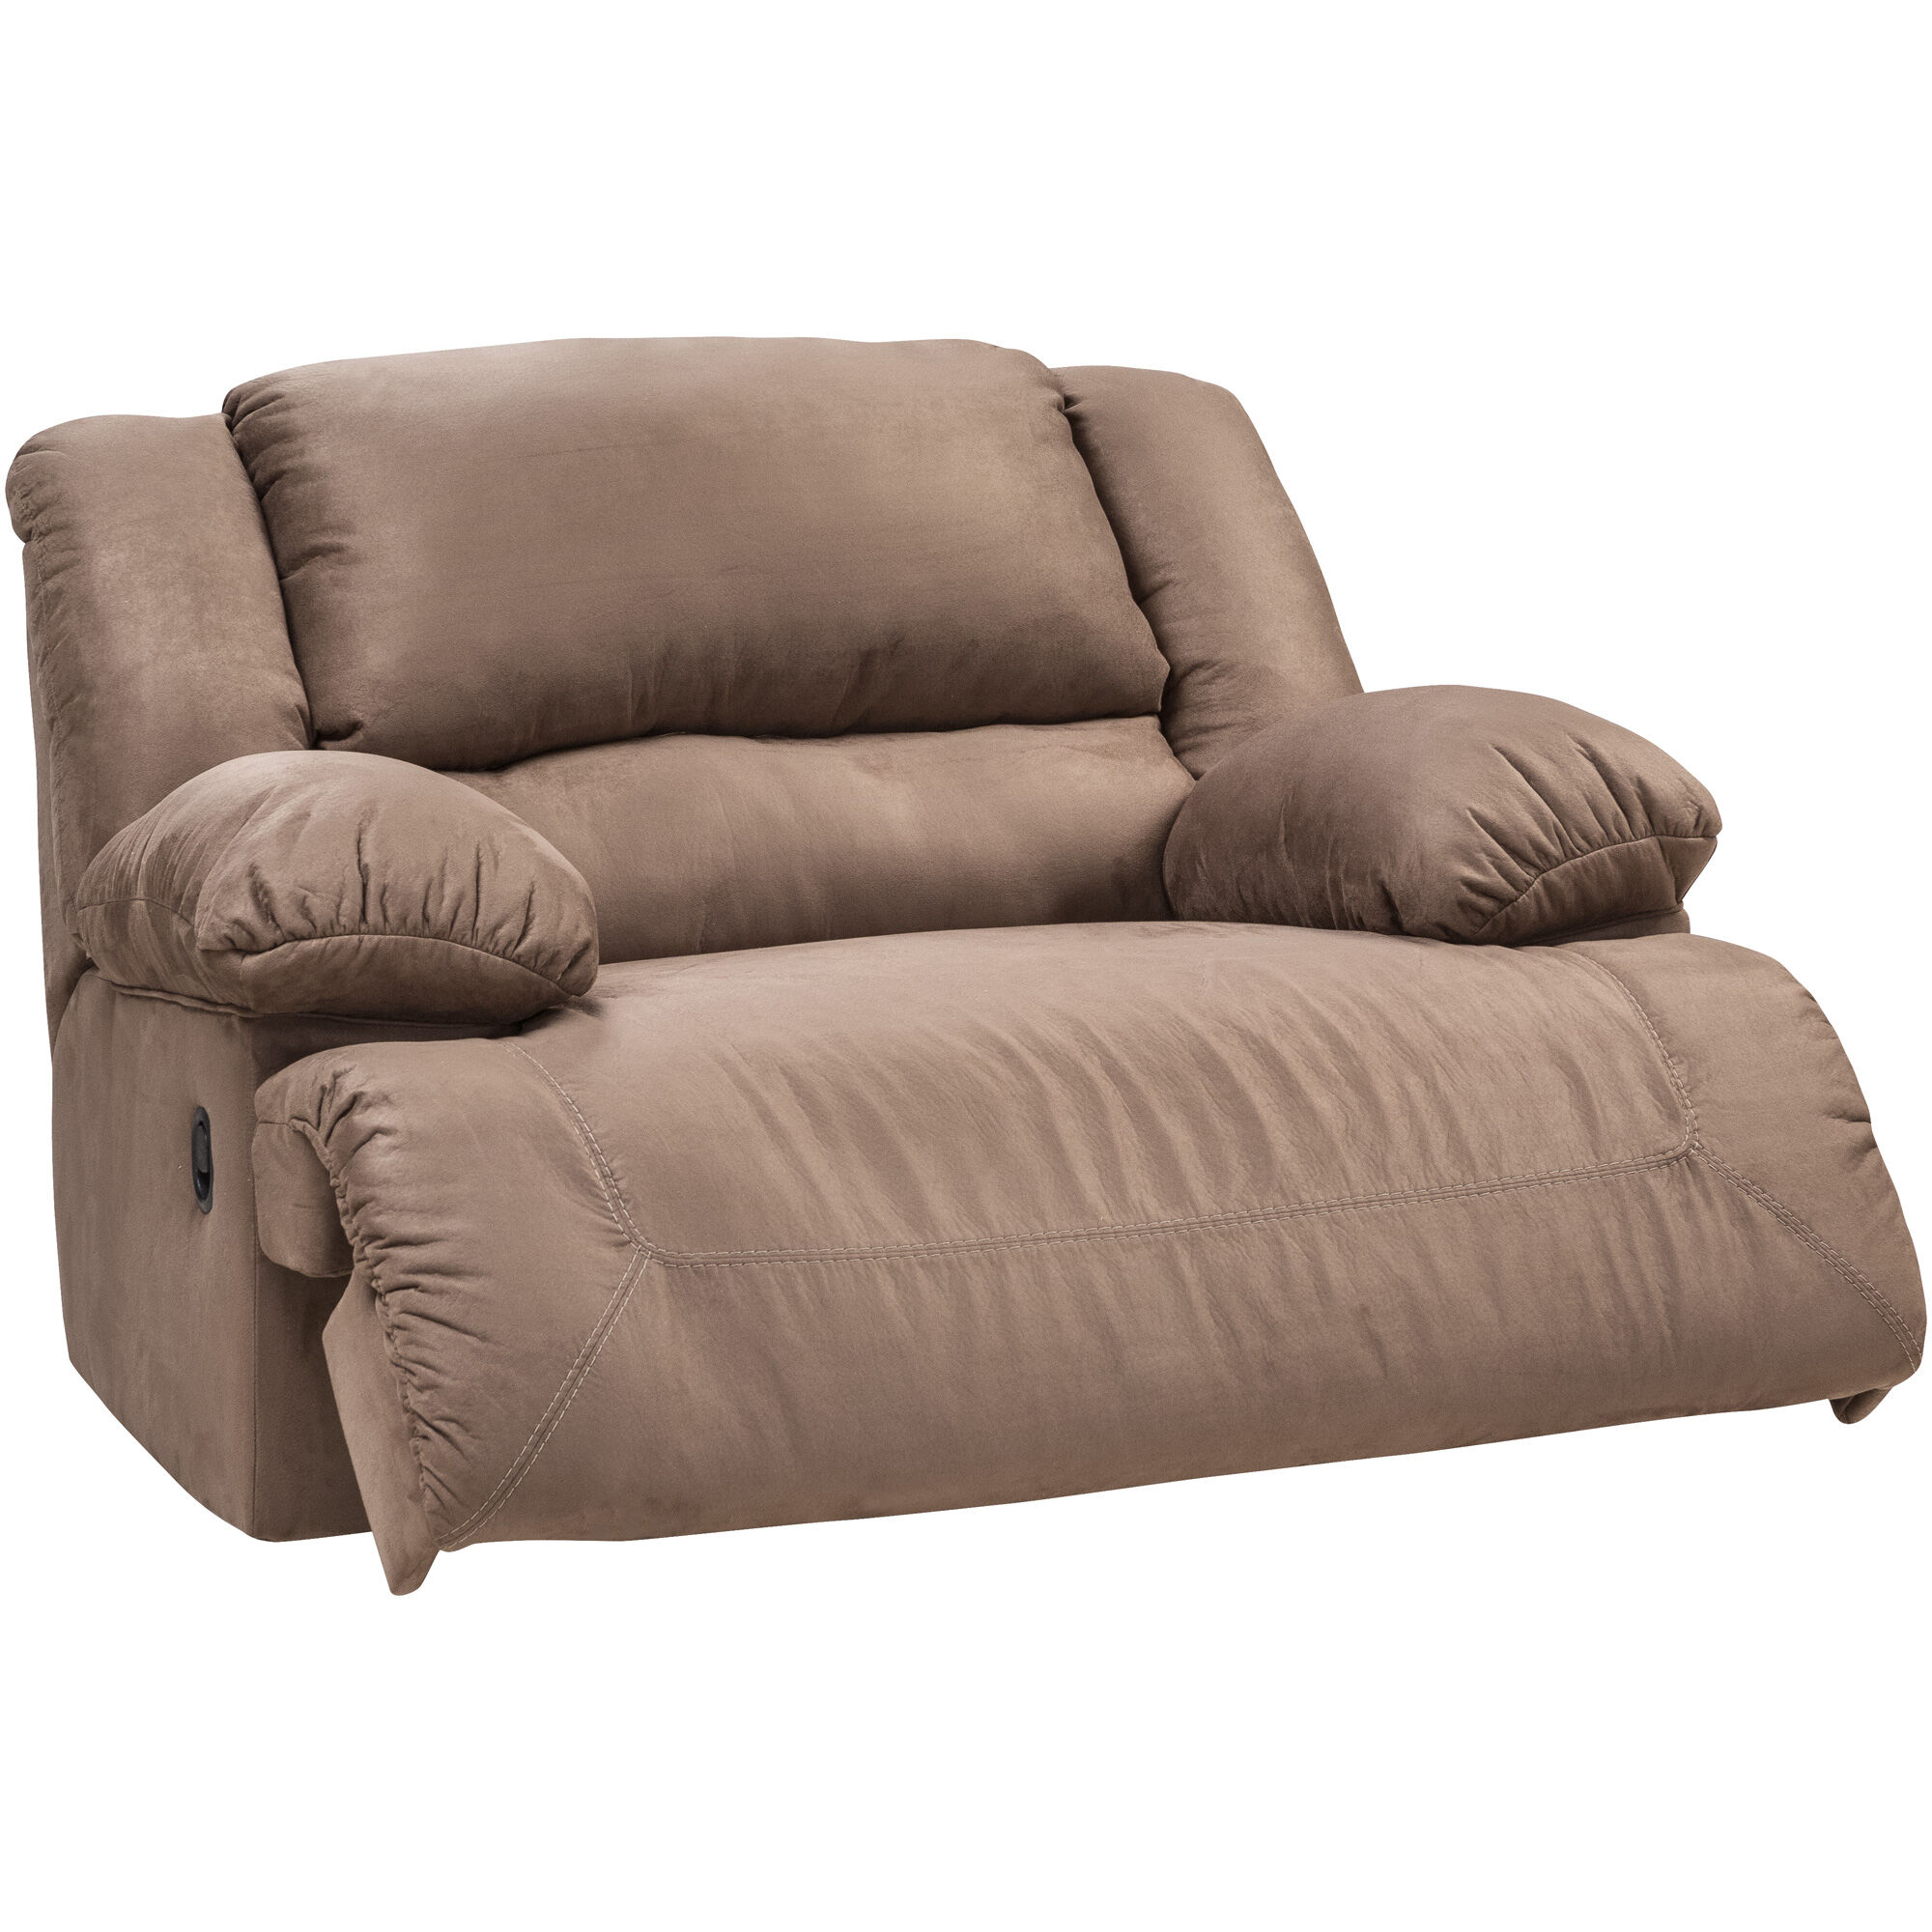 Crownley Mocha Reclining Chair; Crownley Mocha Reclining Chair ...  sc 1 st  Slumberland Furniture & Slumberland Furniture | Crownley Mocha Reclining Chair